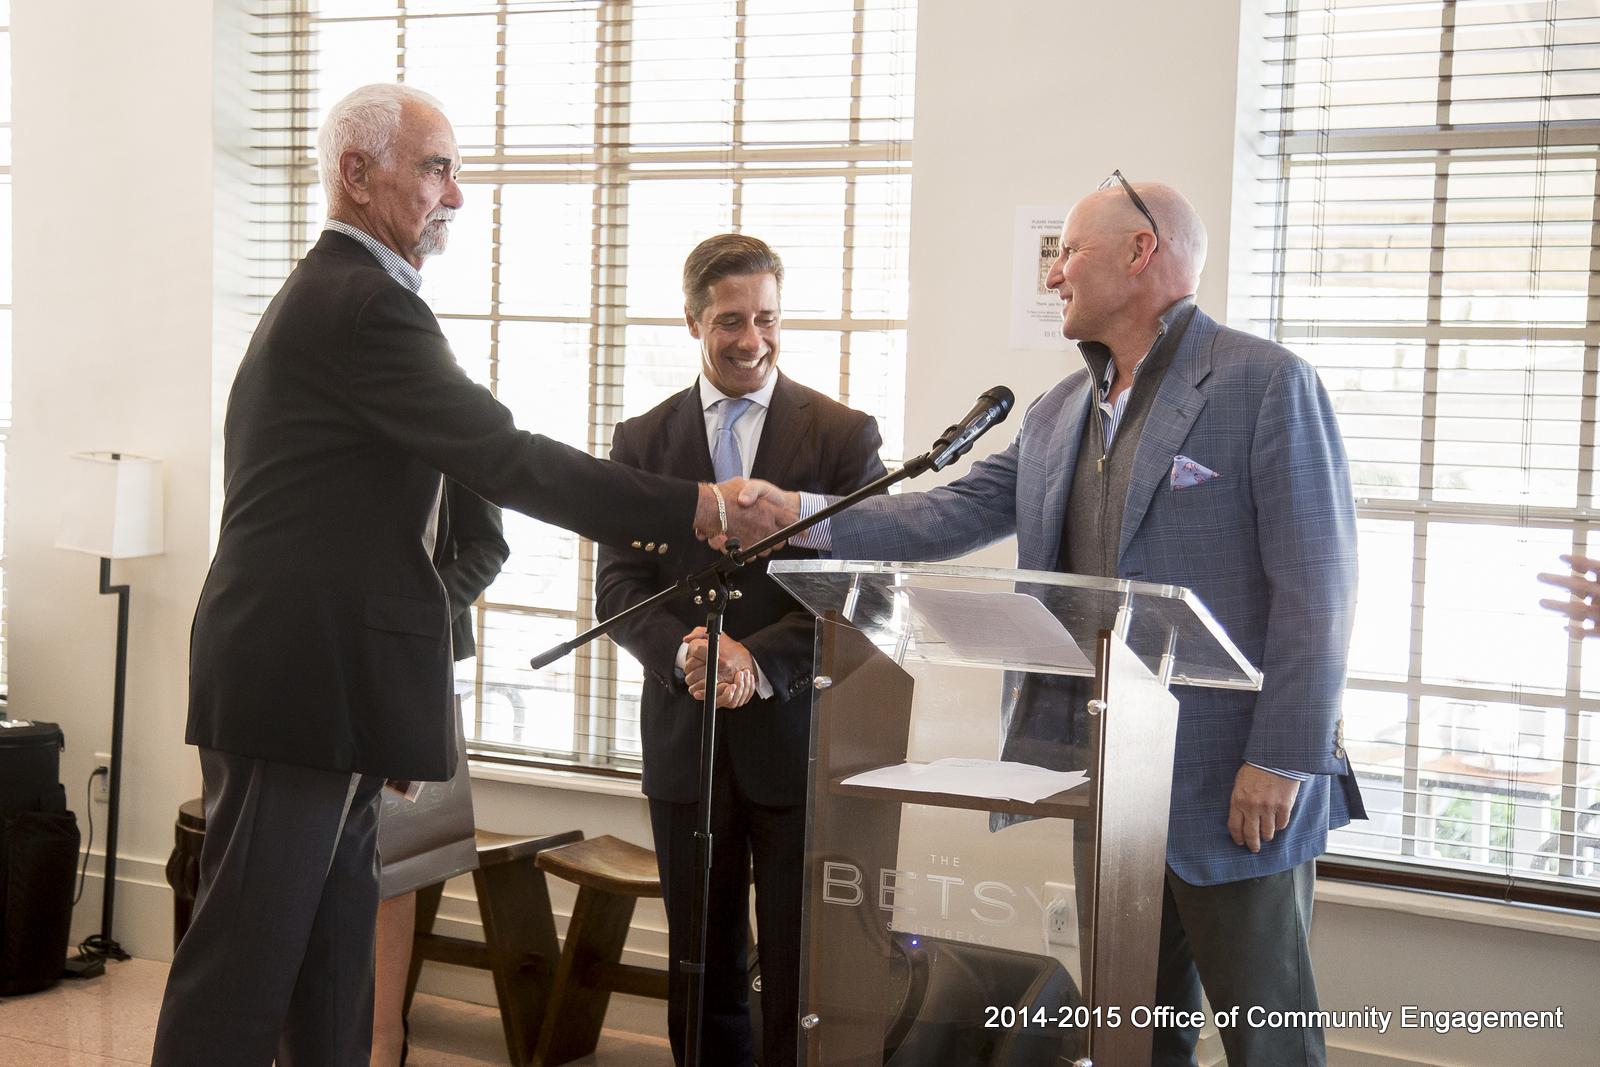 Elie Wiesel AwardsBetsy Hotel05_20_2015Jimmy Abraham_MDCPS_32.jpg